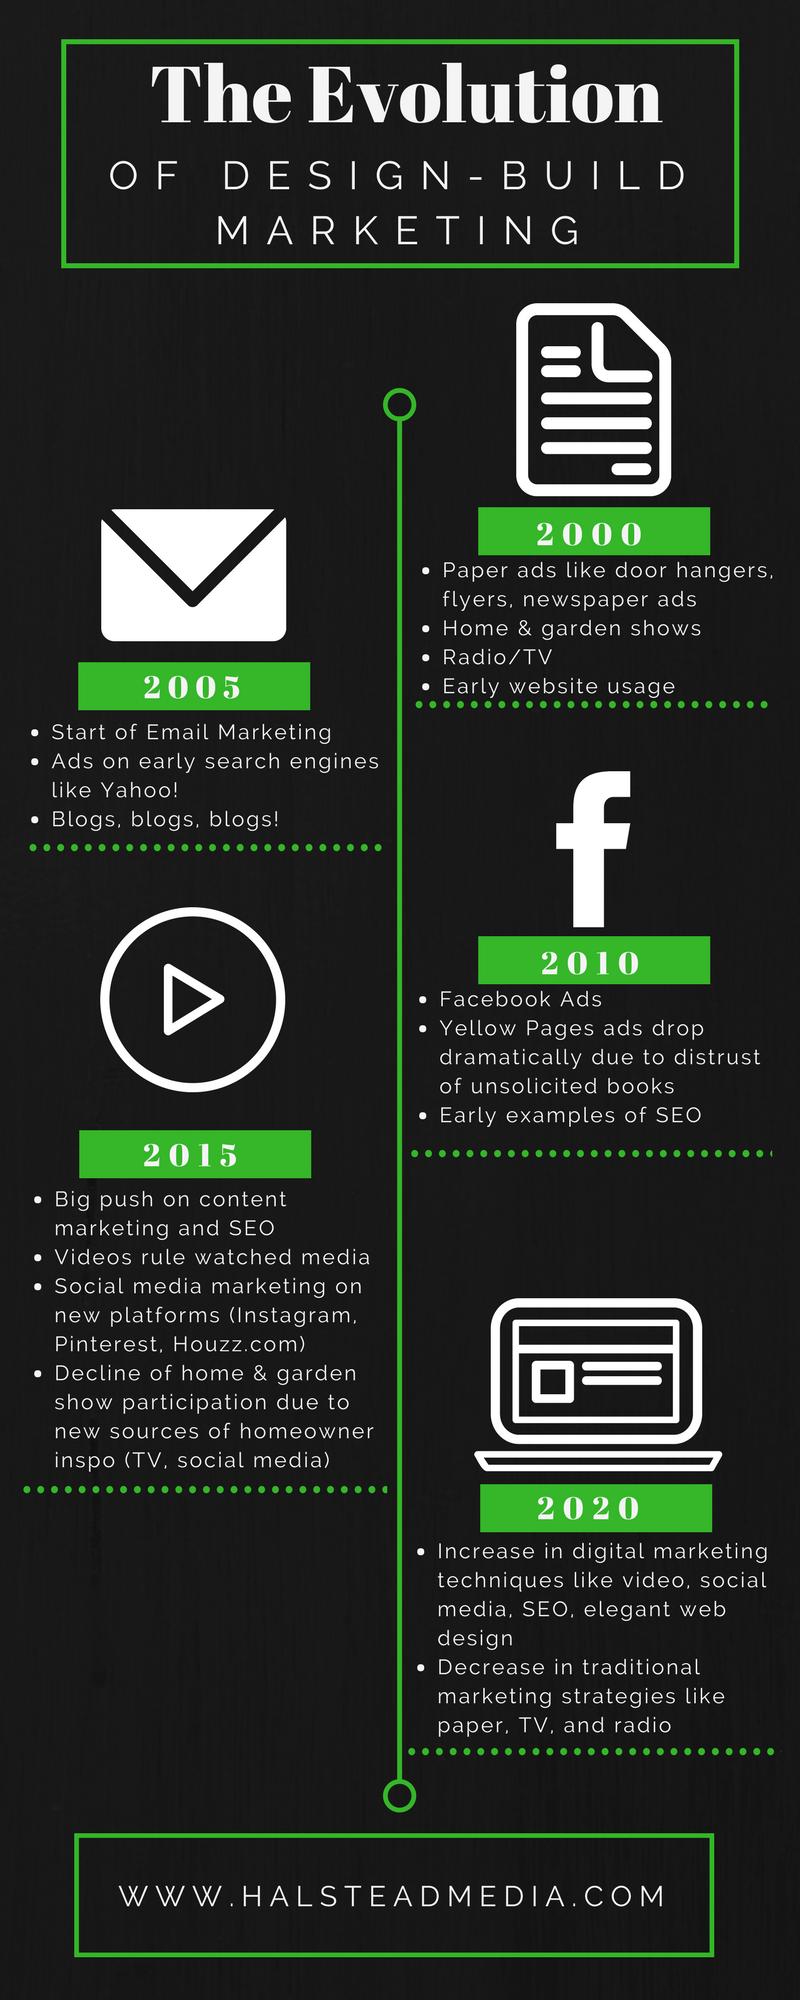 Evolution of Design-Build Marketing